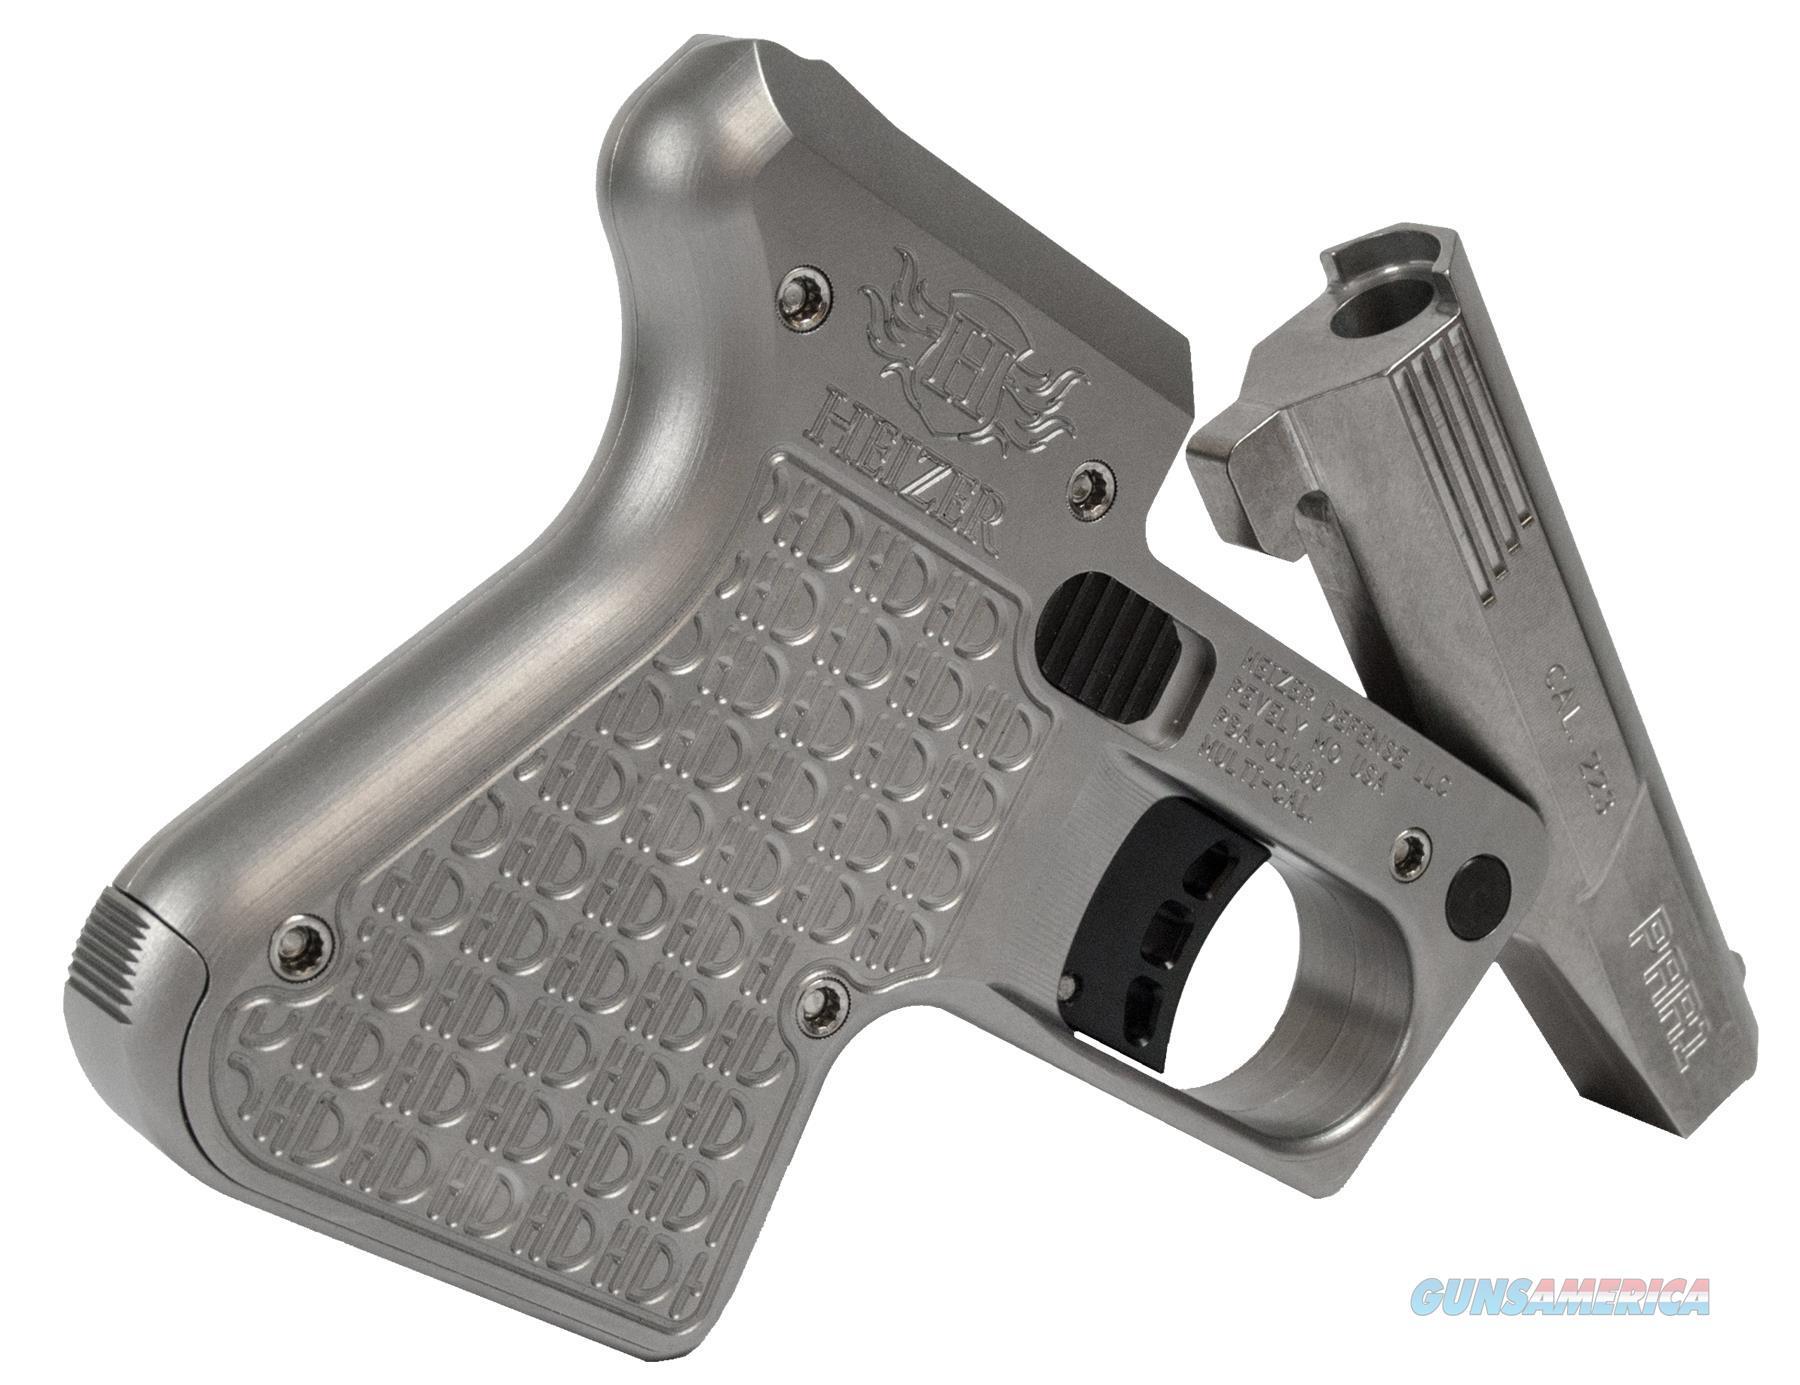 "Heizer Par1ss Par1 Pocket Ar Ar Pistol Single 223 Remington/5.56 Nato 3.875"" 1 Round Stainless Finish PAR1SS  Guns > Pistols > H Misc Pistols"